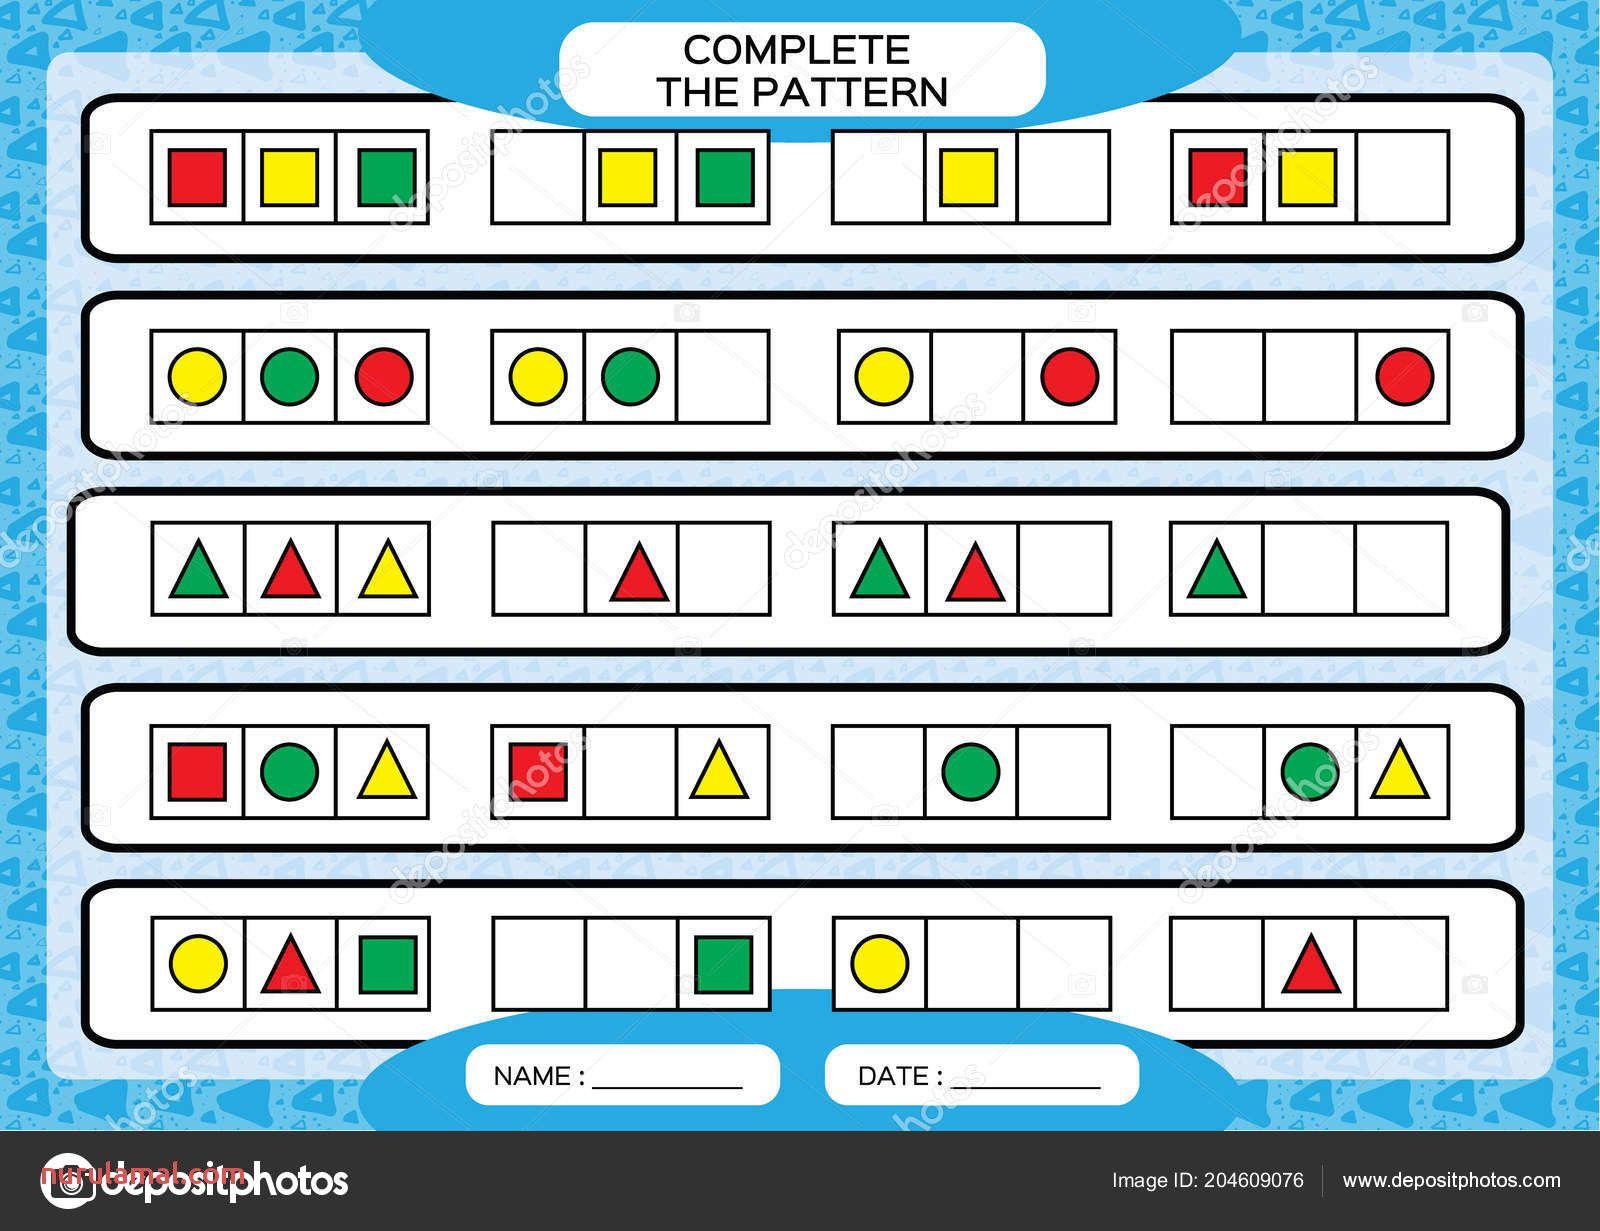 22 Fall Preschool Pattern Worksheets Coloring Style